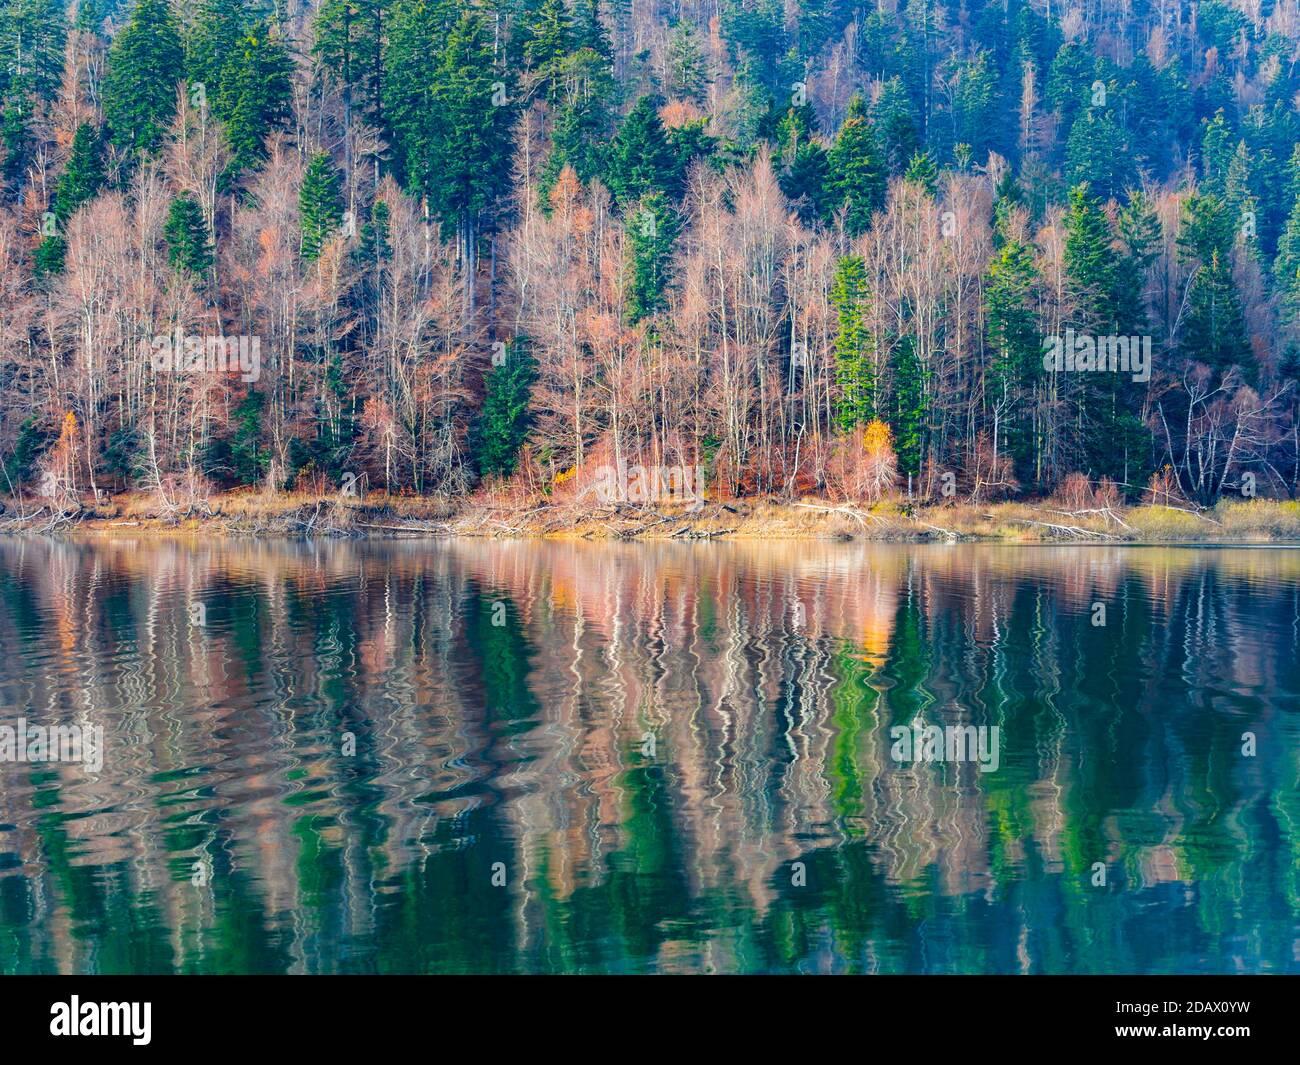 Stunning serene late Autumnal lake reflection with hint of first morning dribble waves Lokve lake Lokvarsko jezero in Croatia Europe Stock Photo